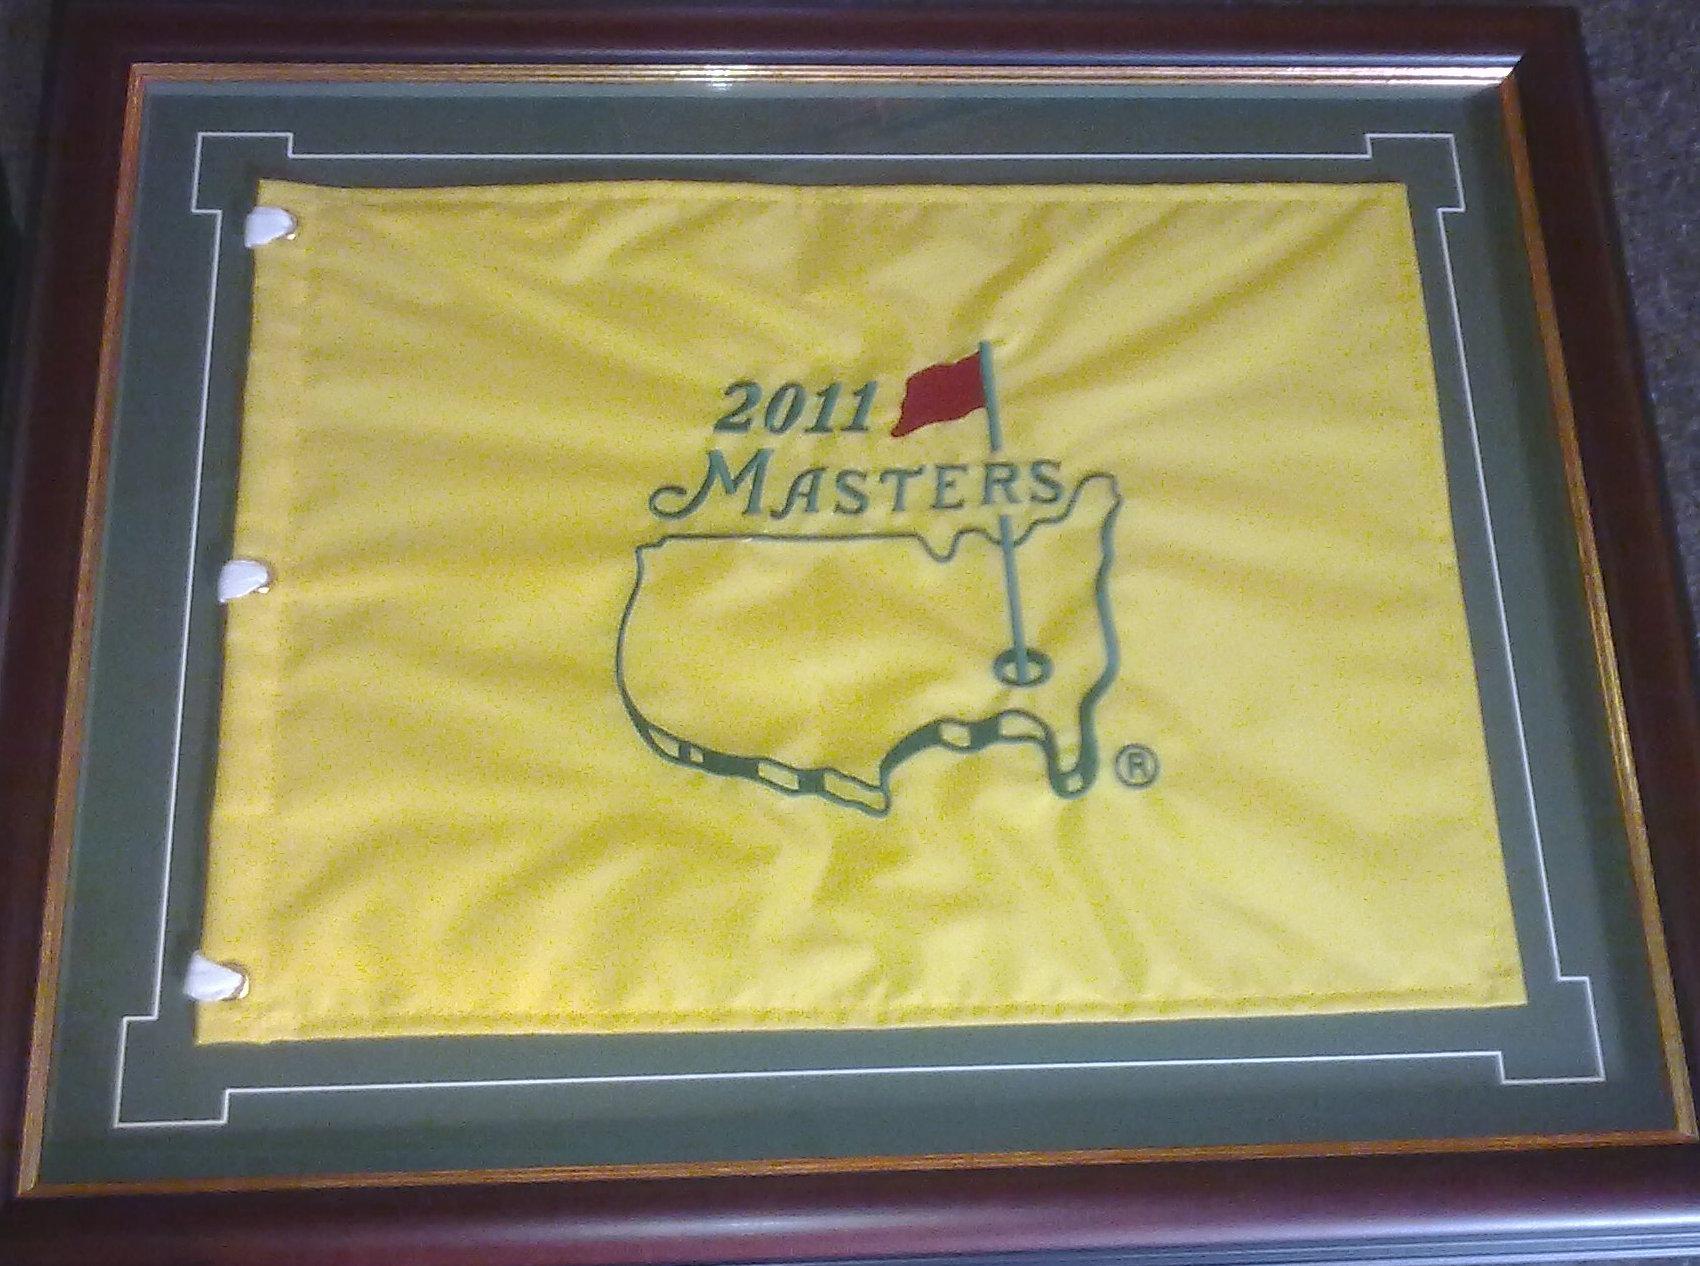 Framed 2011-masters-pin-flag